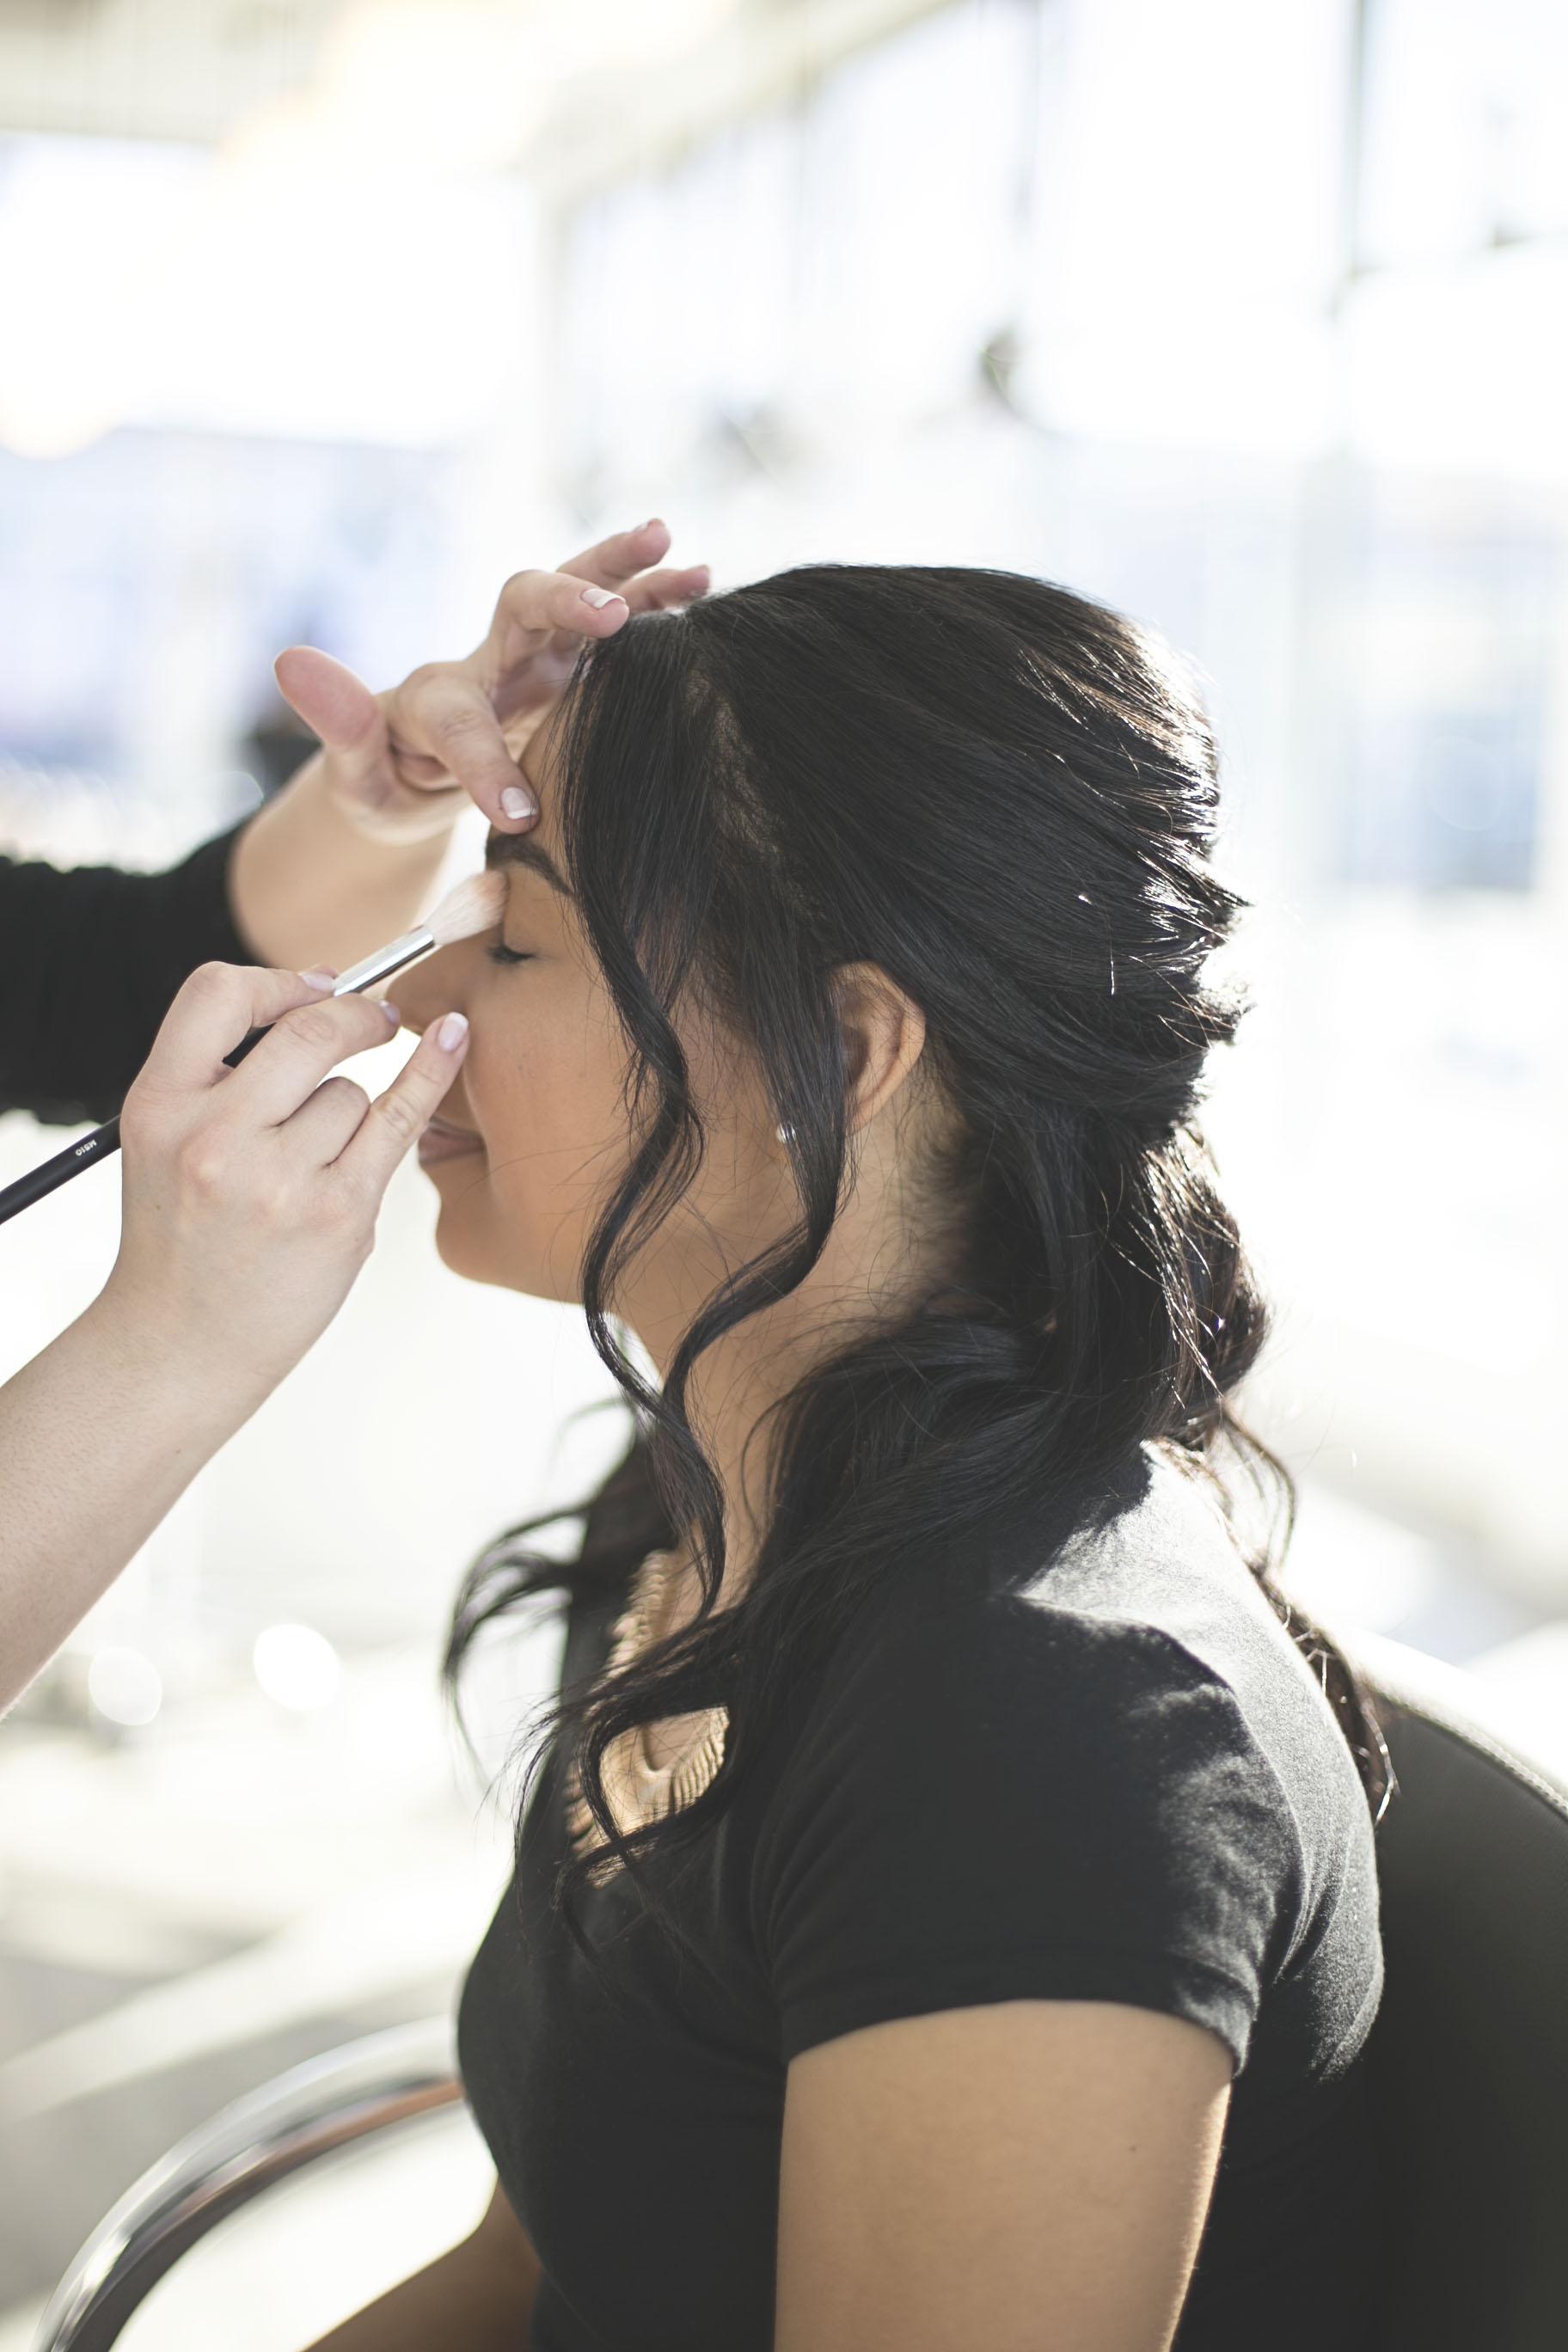 Getting_Makeup_IMG_7649 copy.jpg